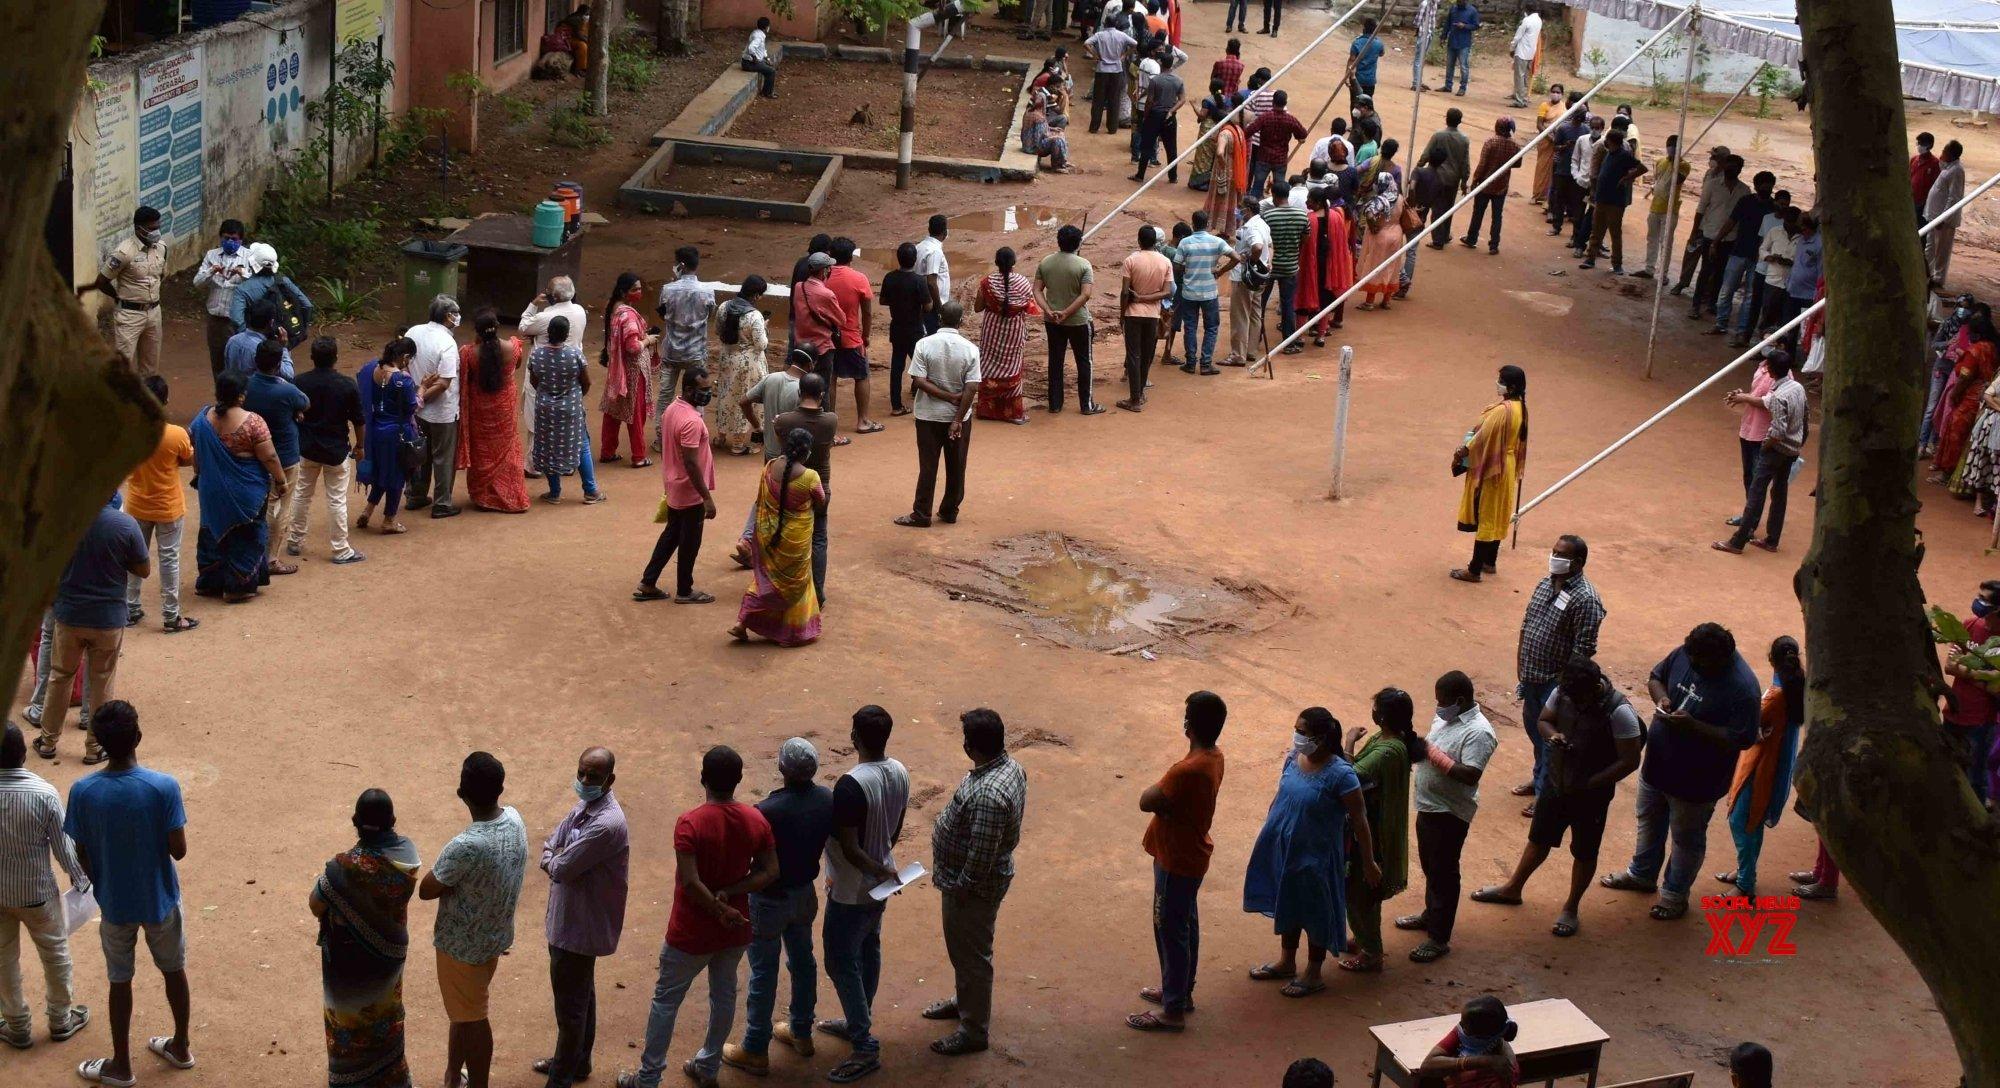 Hyderabad : People stand in a queue at - Govt. High school Musheerabad - to receive Covid 19 vaccine - in Hyderabad. #Gallery